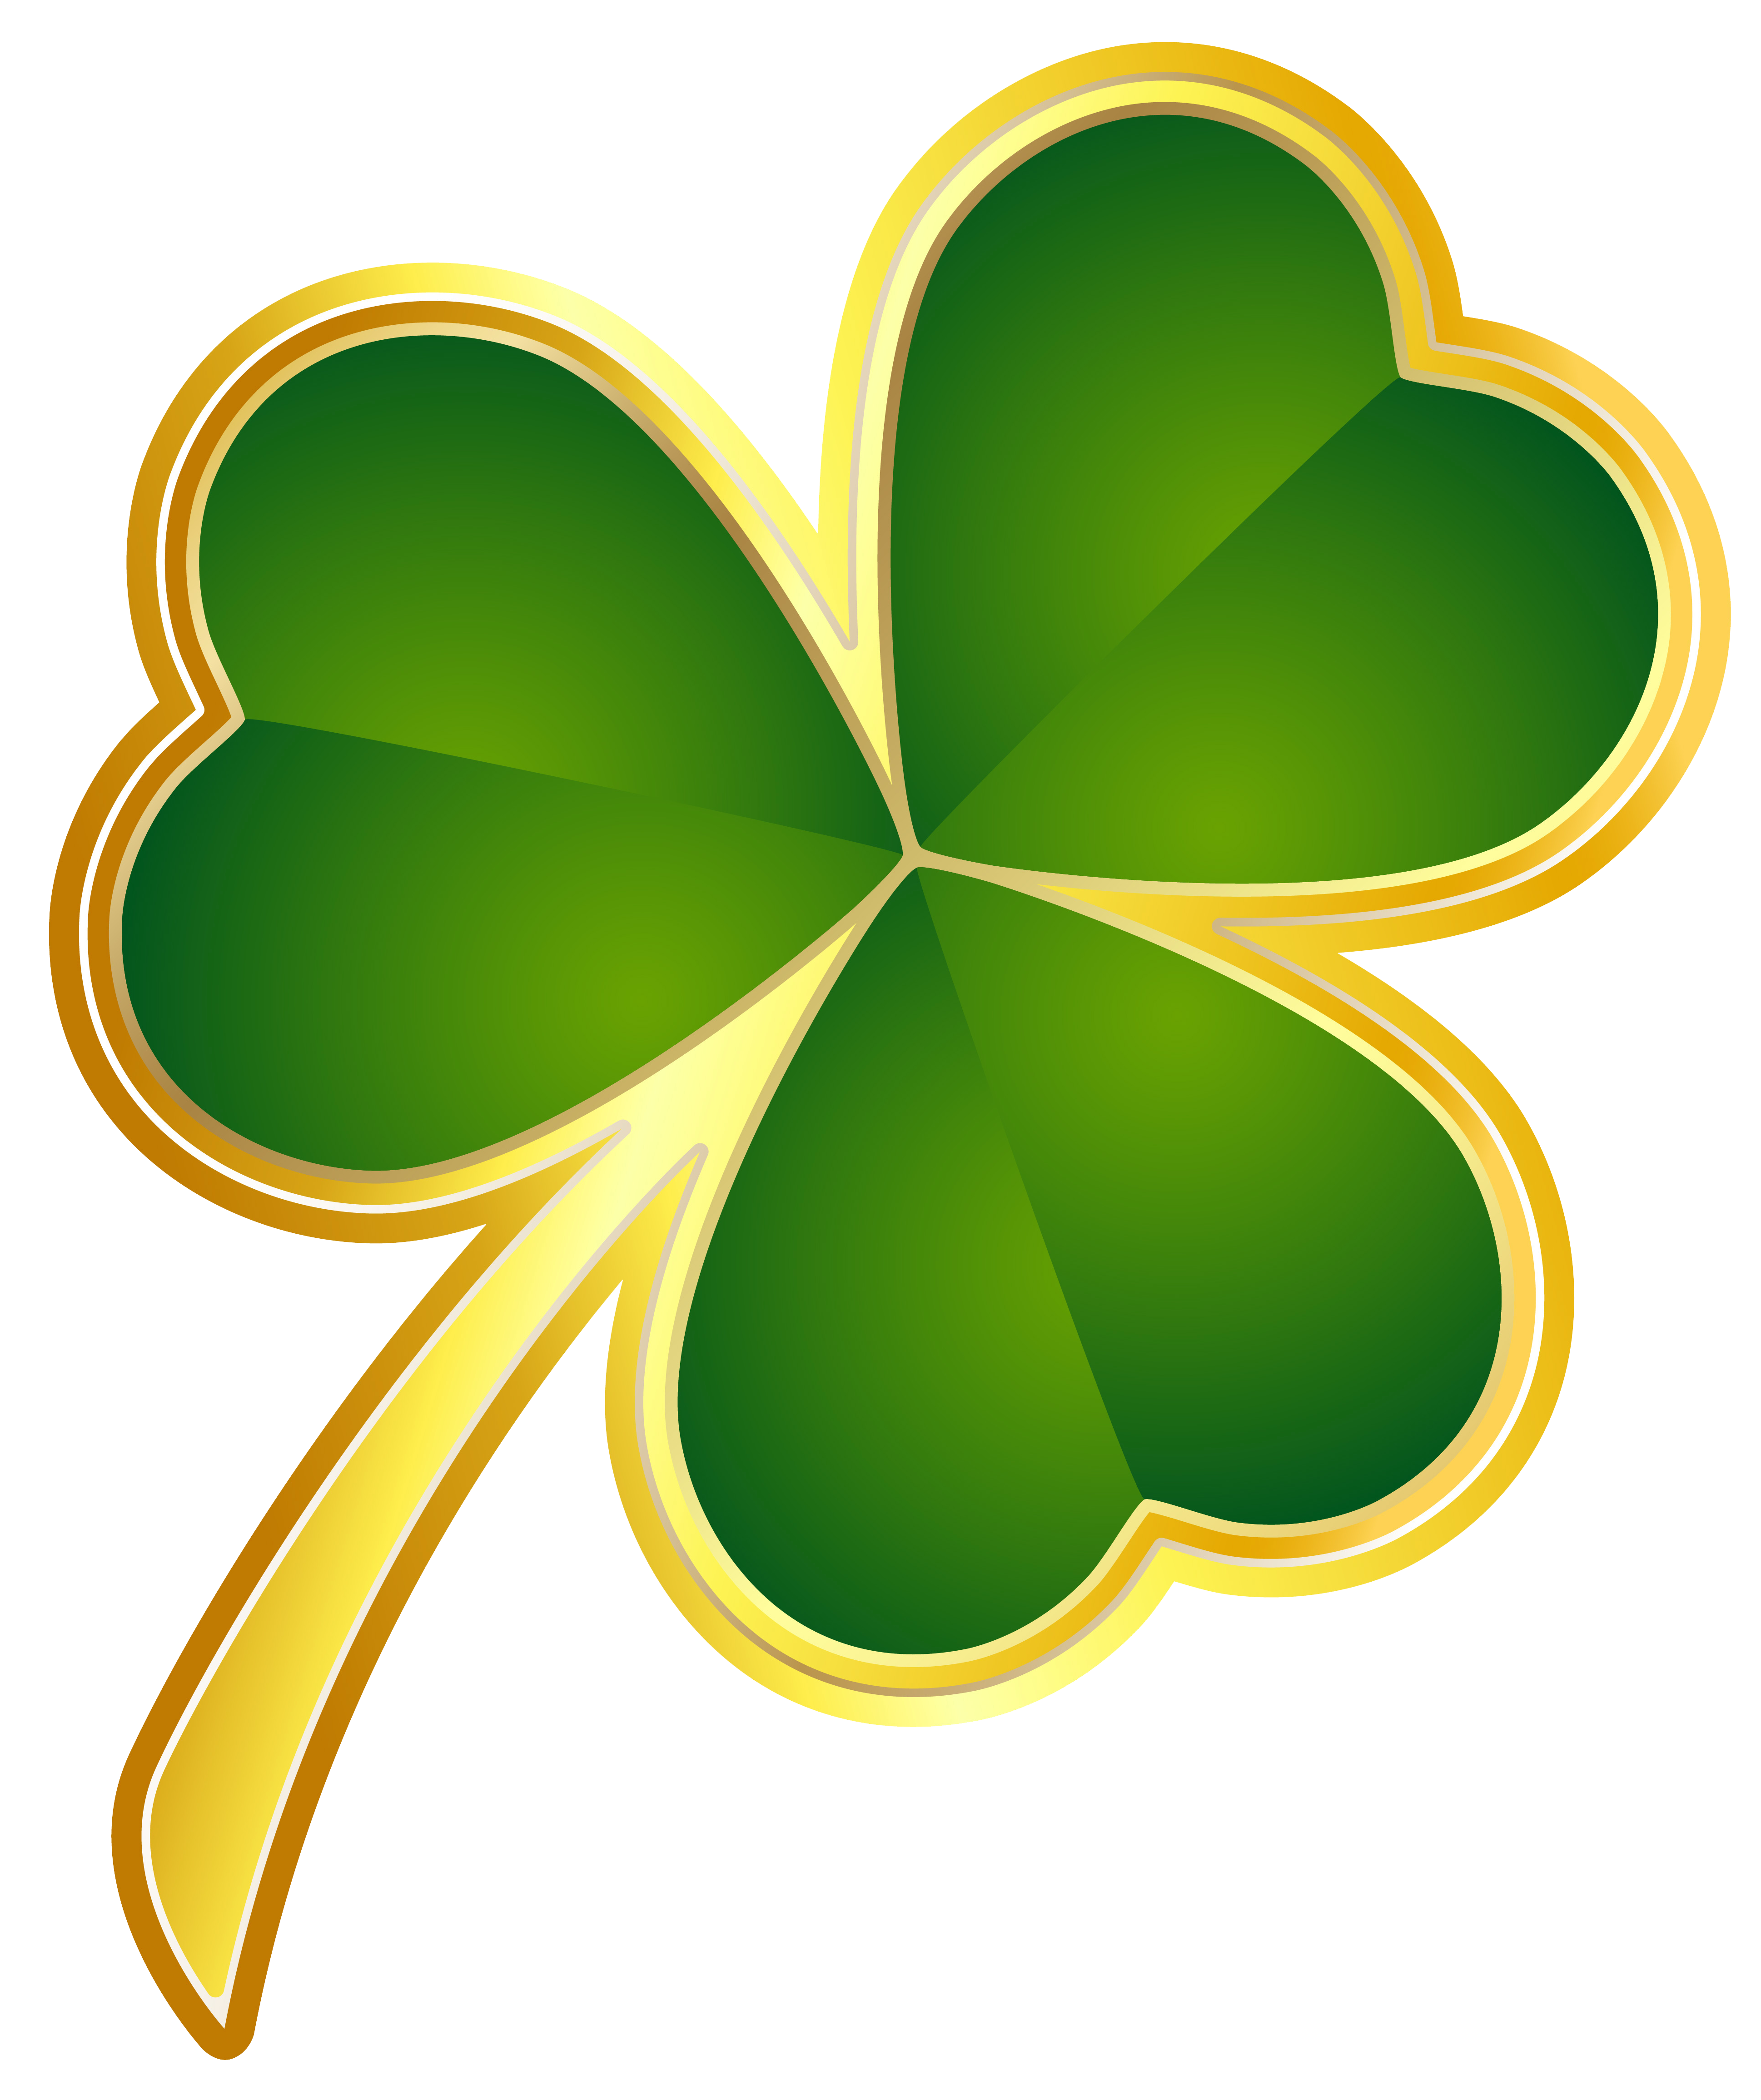 St Patricks Day Gold Shamrock Png Clipart St Patricks Day Pictures St Patricks Day Clipart Shamrock Art